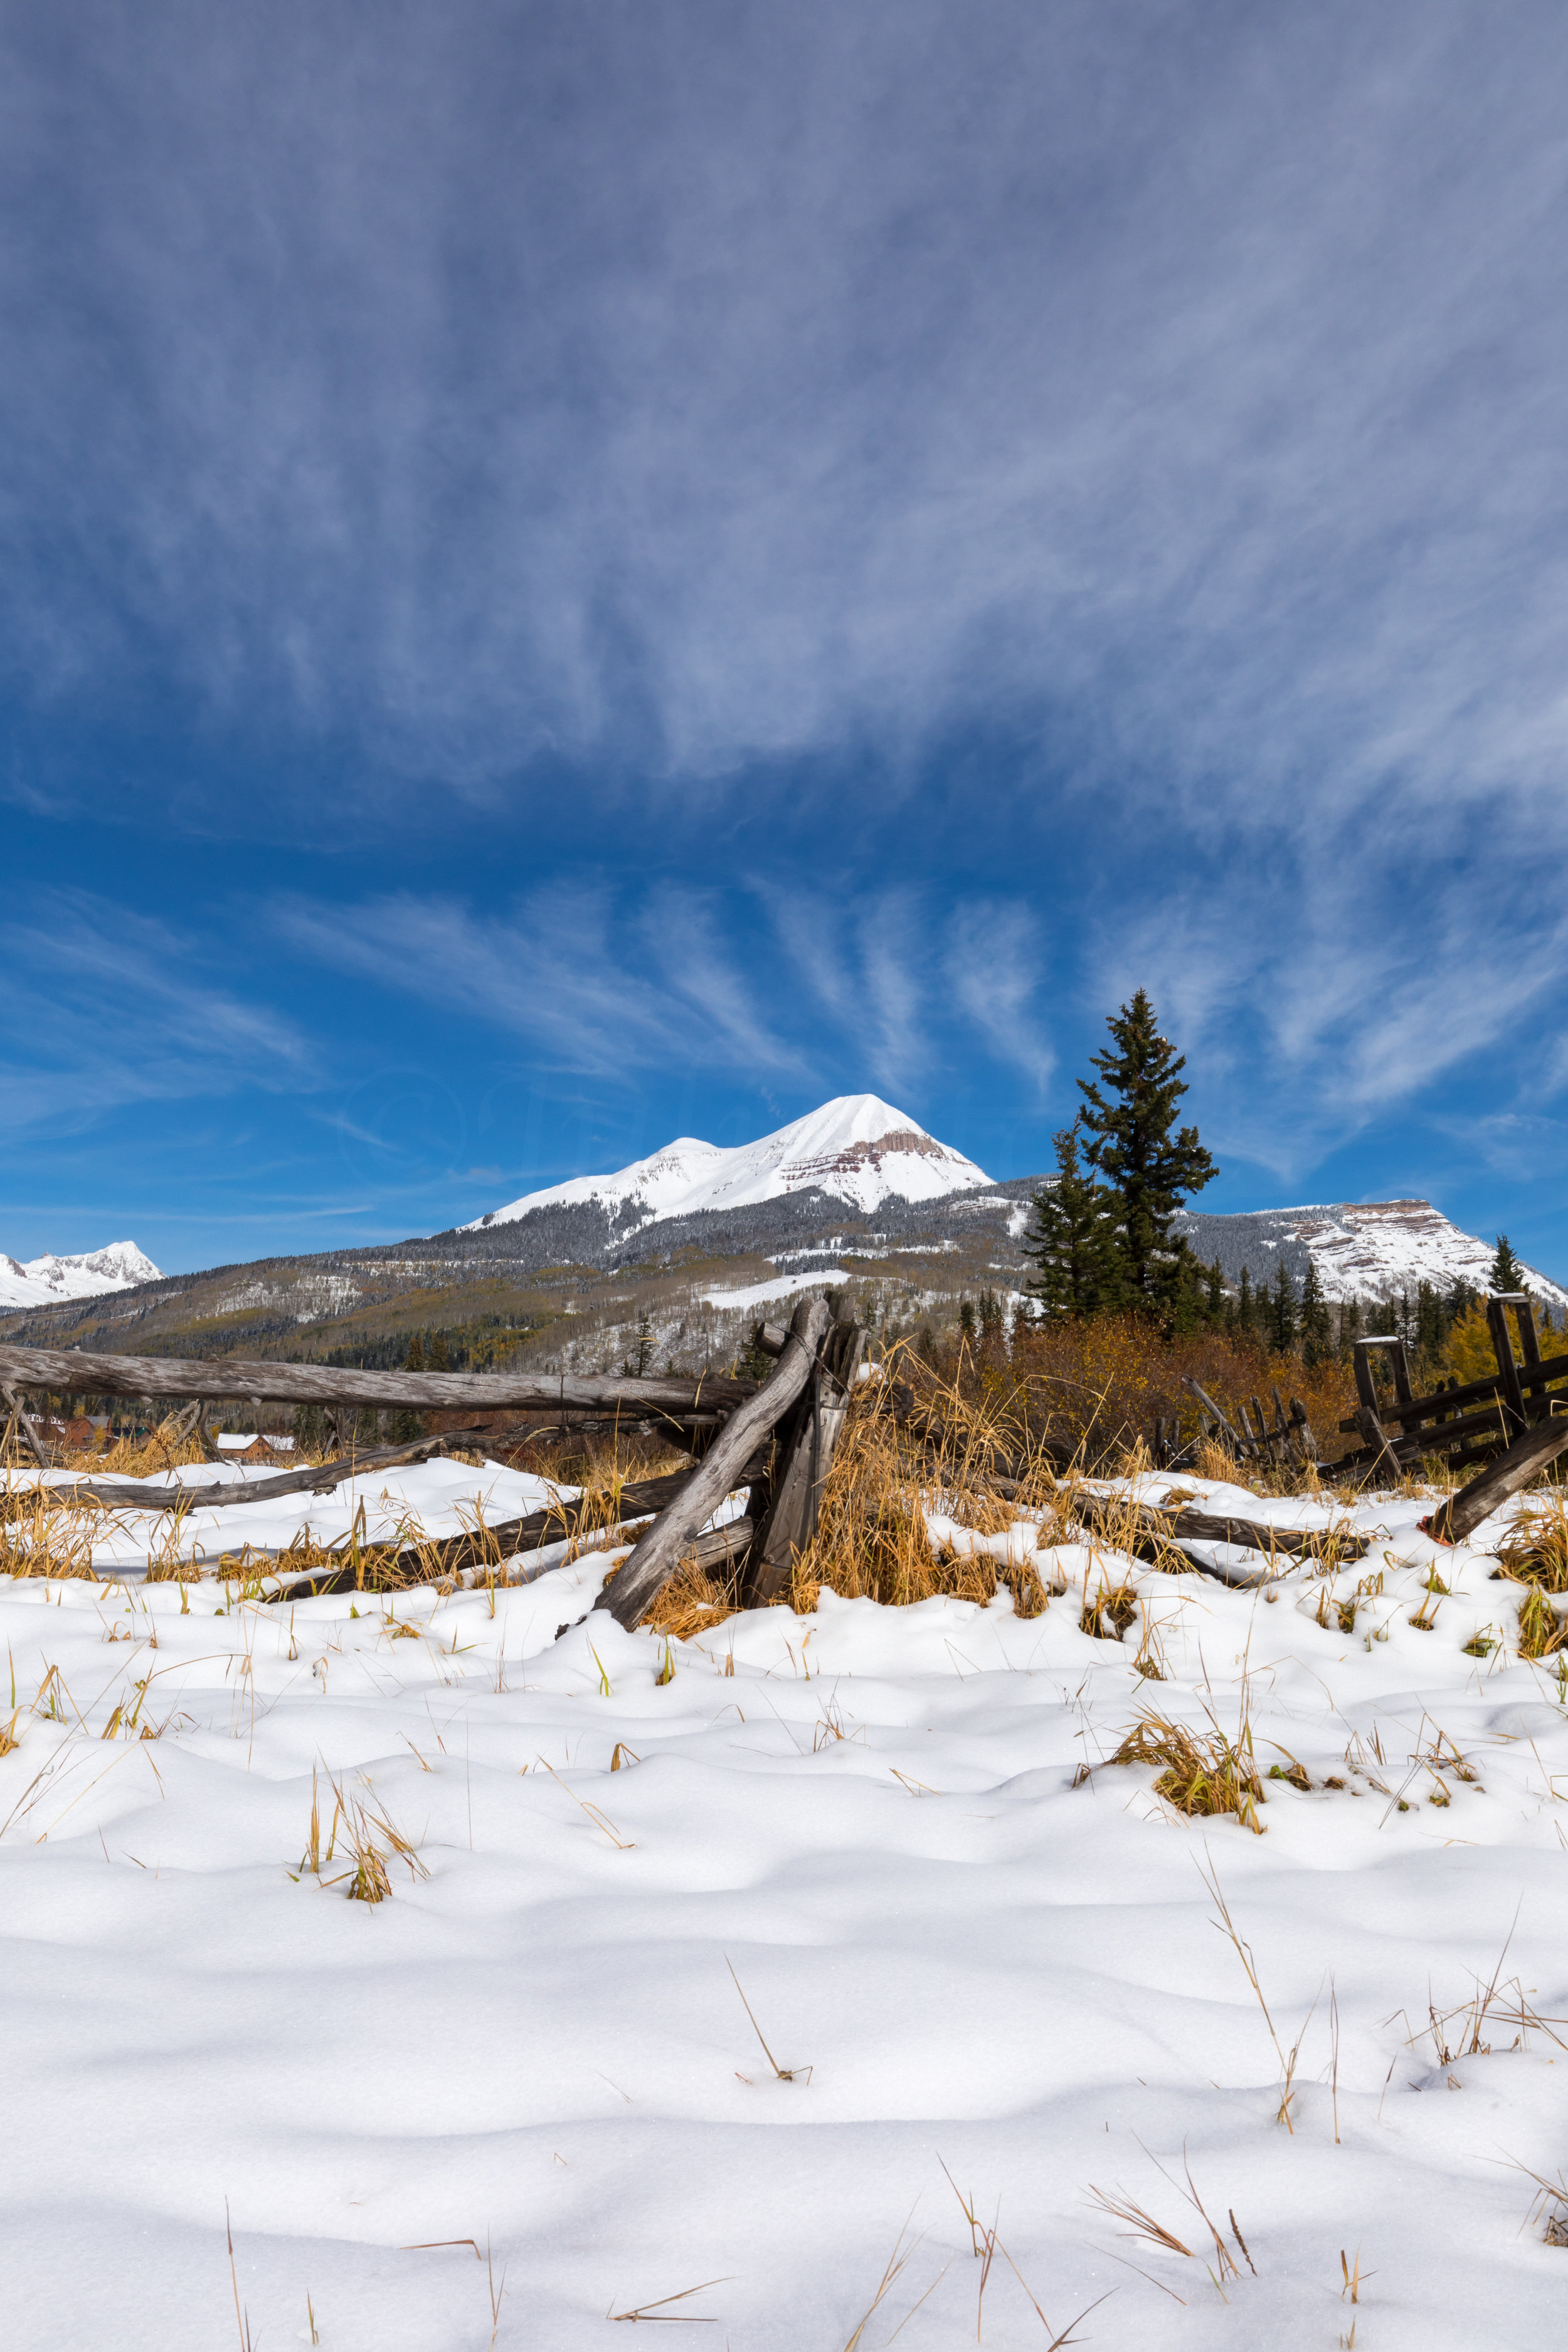 Engineer Mountain, Image # 0113